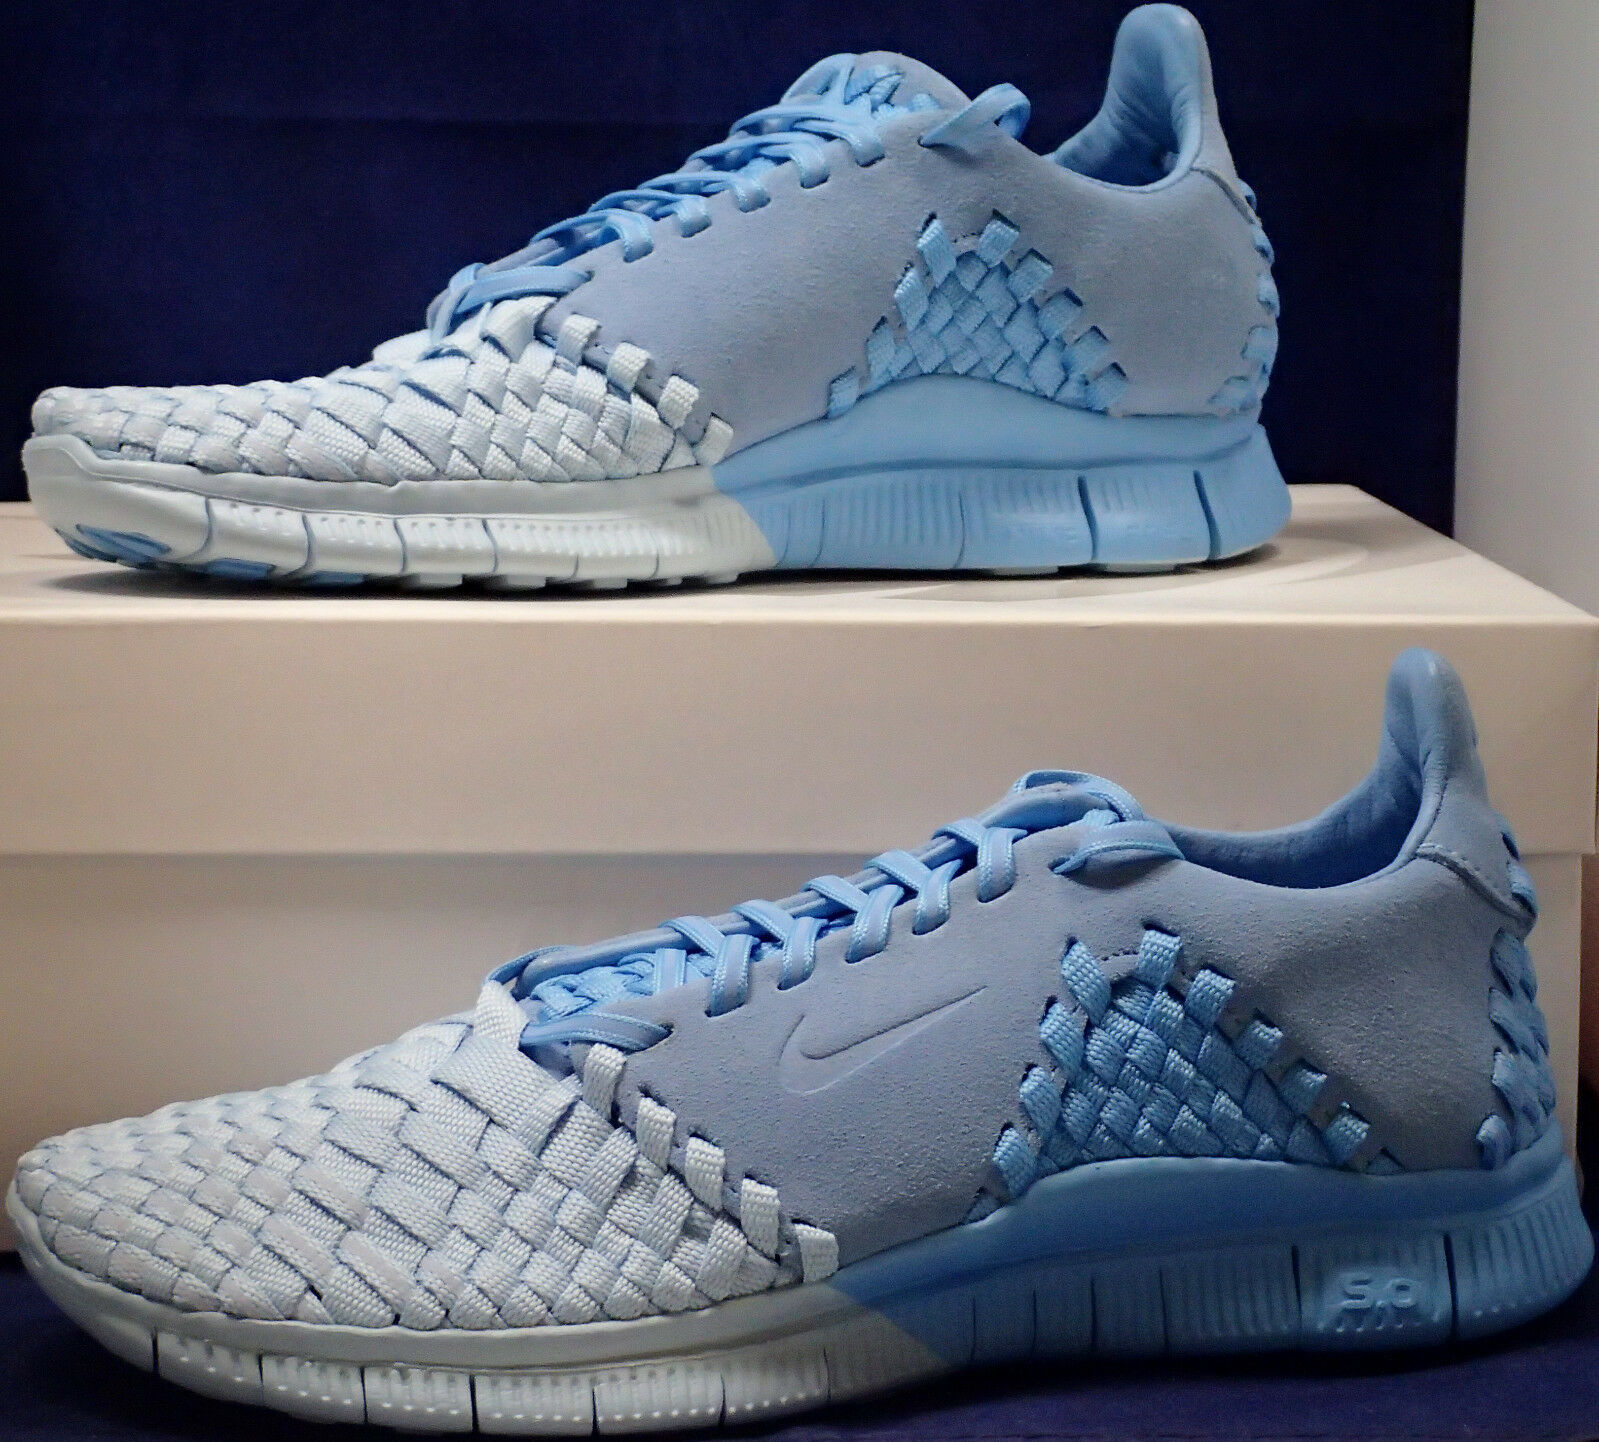 Nike libera inneva tessuti ii 2 sp lakeside blu ghiaccio footscape sz (813040-440)